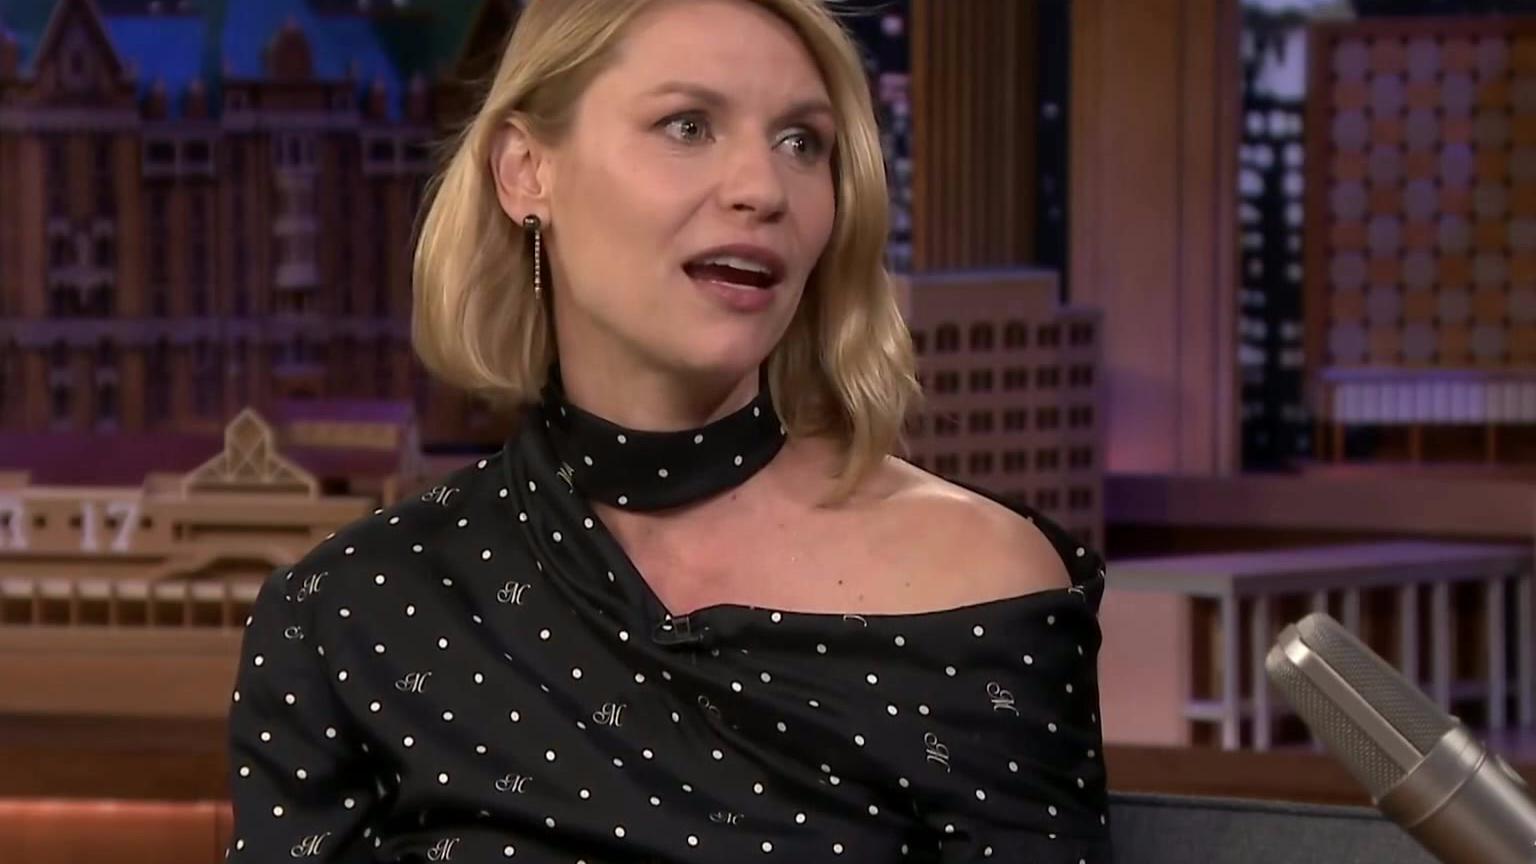 《国土安全》第8季采访 Claire Danes 参加The Tonight Show